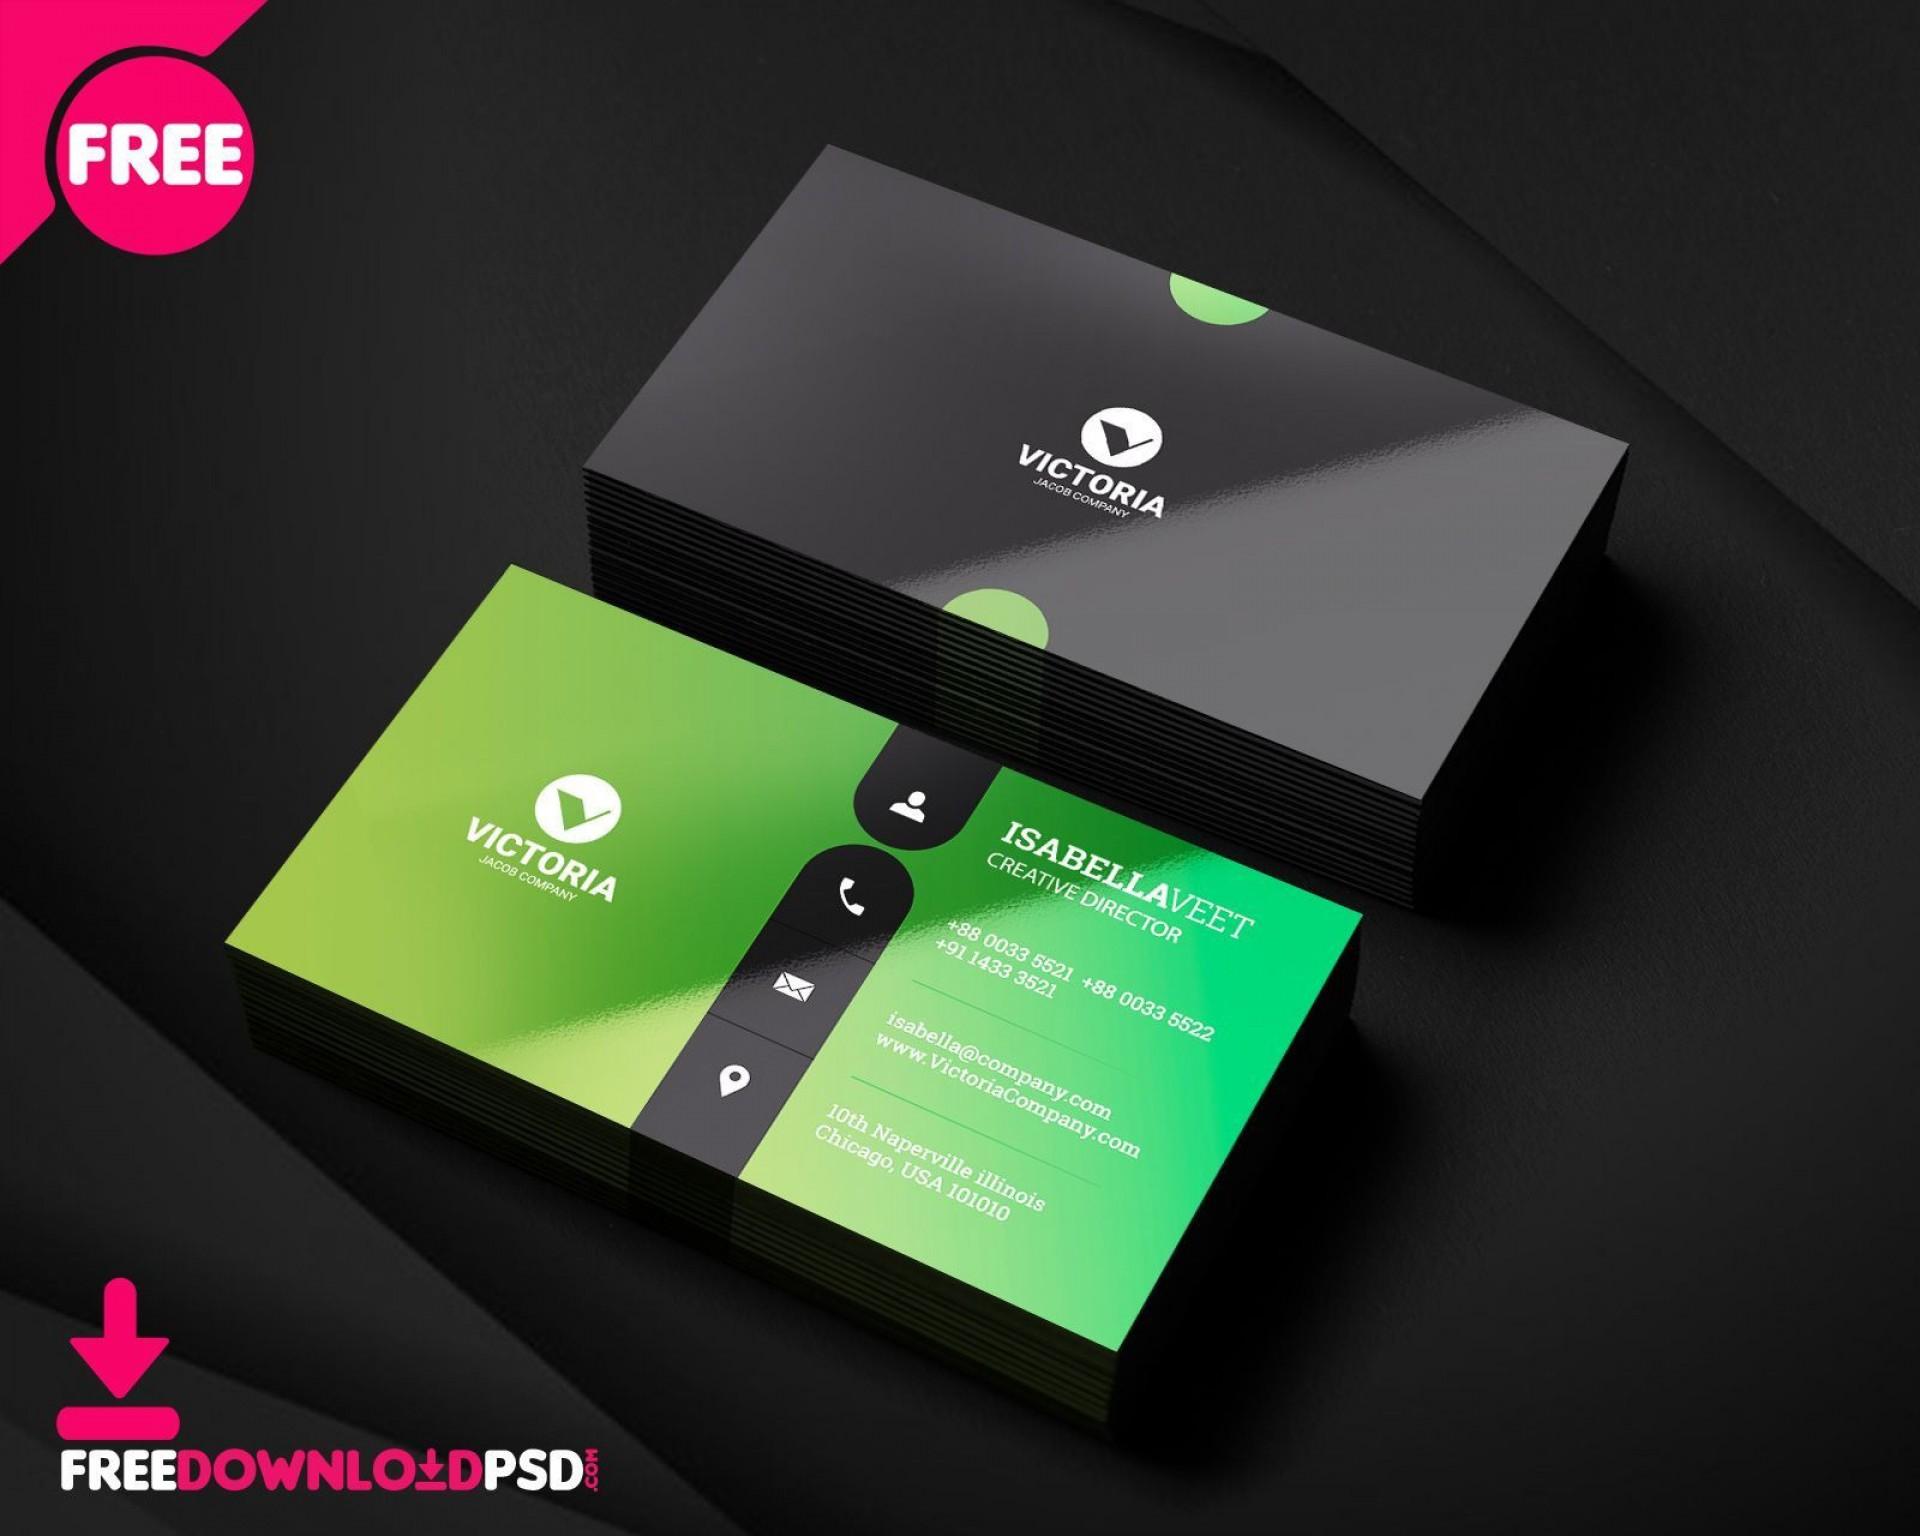 001 Wonderful Simple Visiting Card Design Free Download Image  Busines Psd Coreldraw File1920